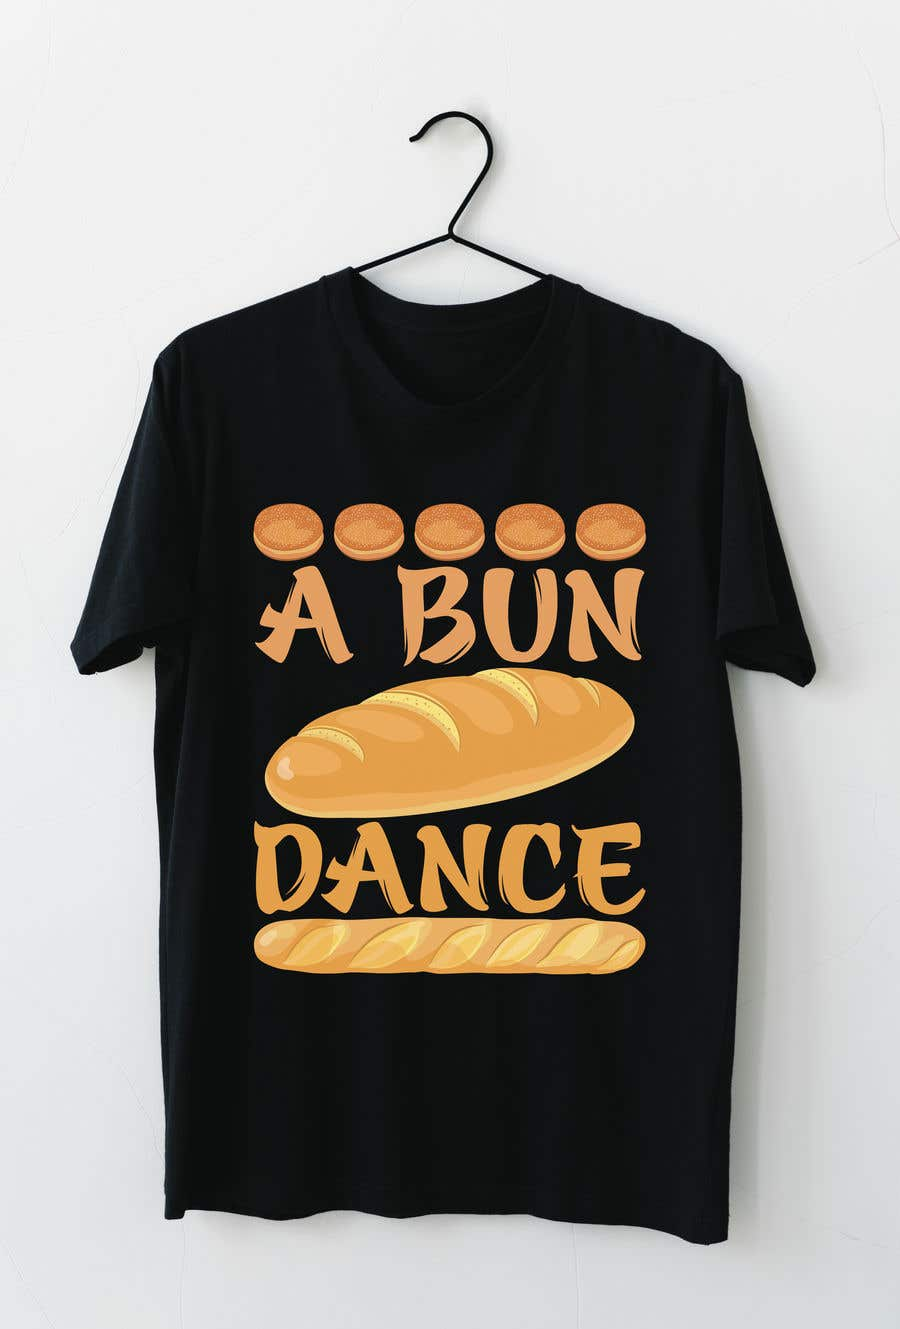 Bài tham dự cuộc thi #                                        15                                      cho                                         A Bun Dance Graphic Design T-Shirt